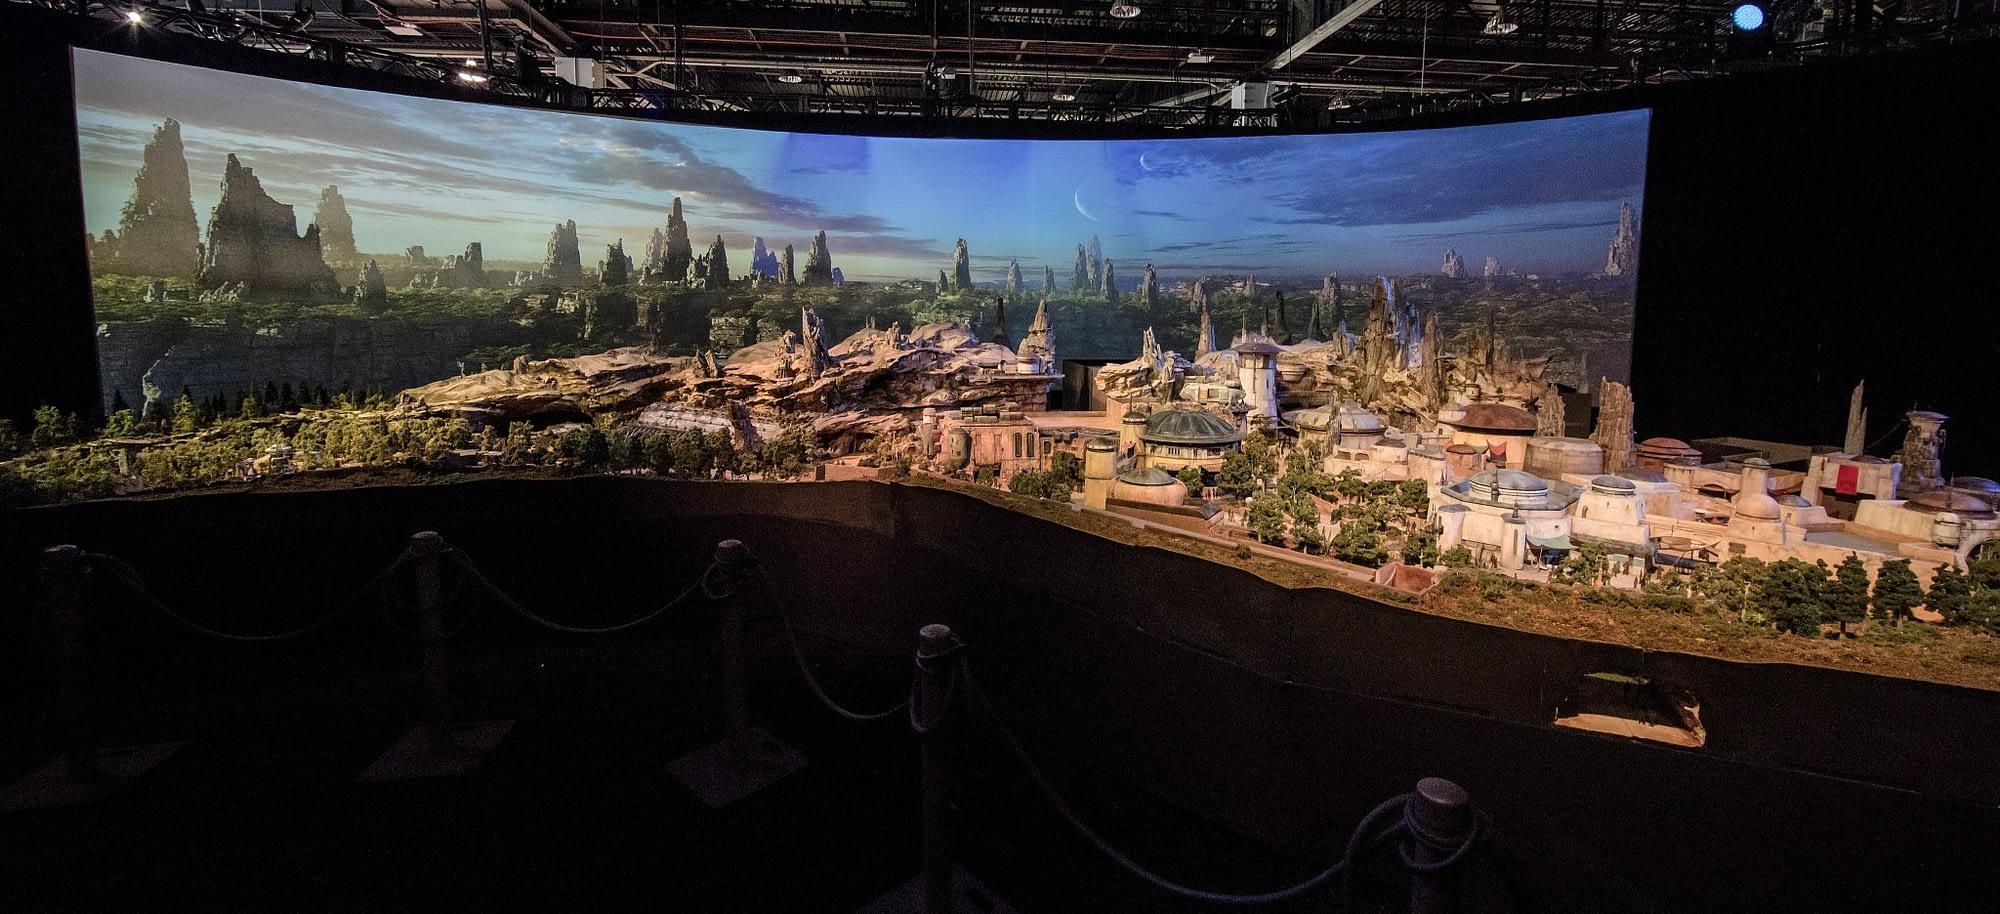 Star Wars Land D23 Reveal Model